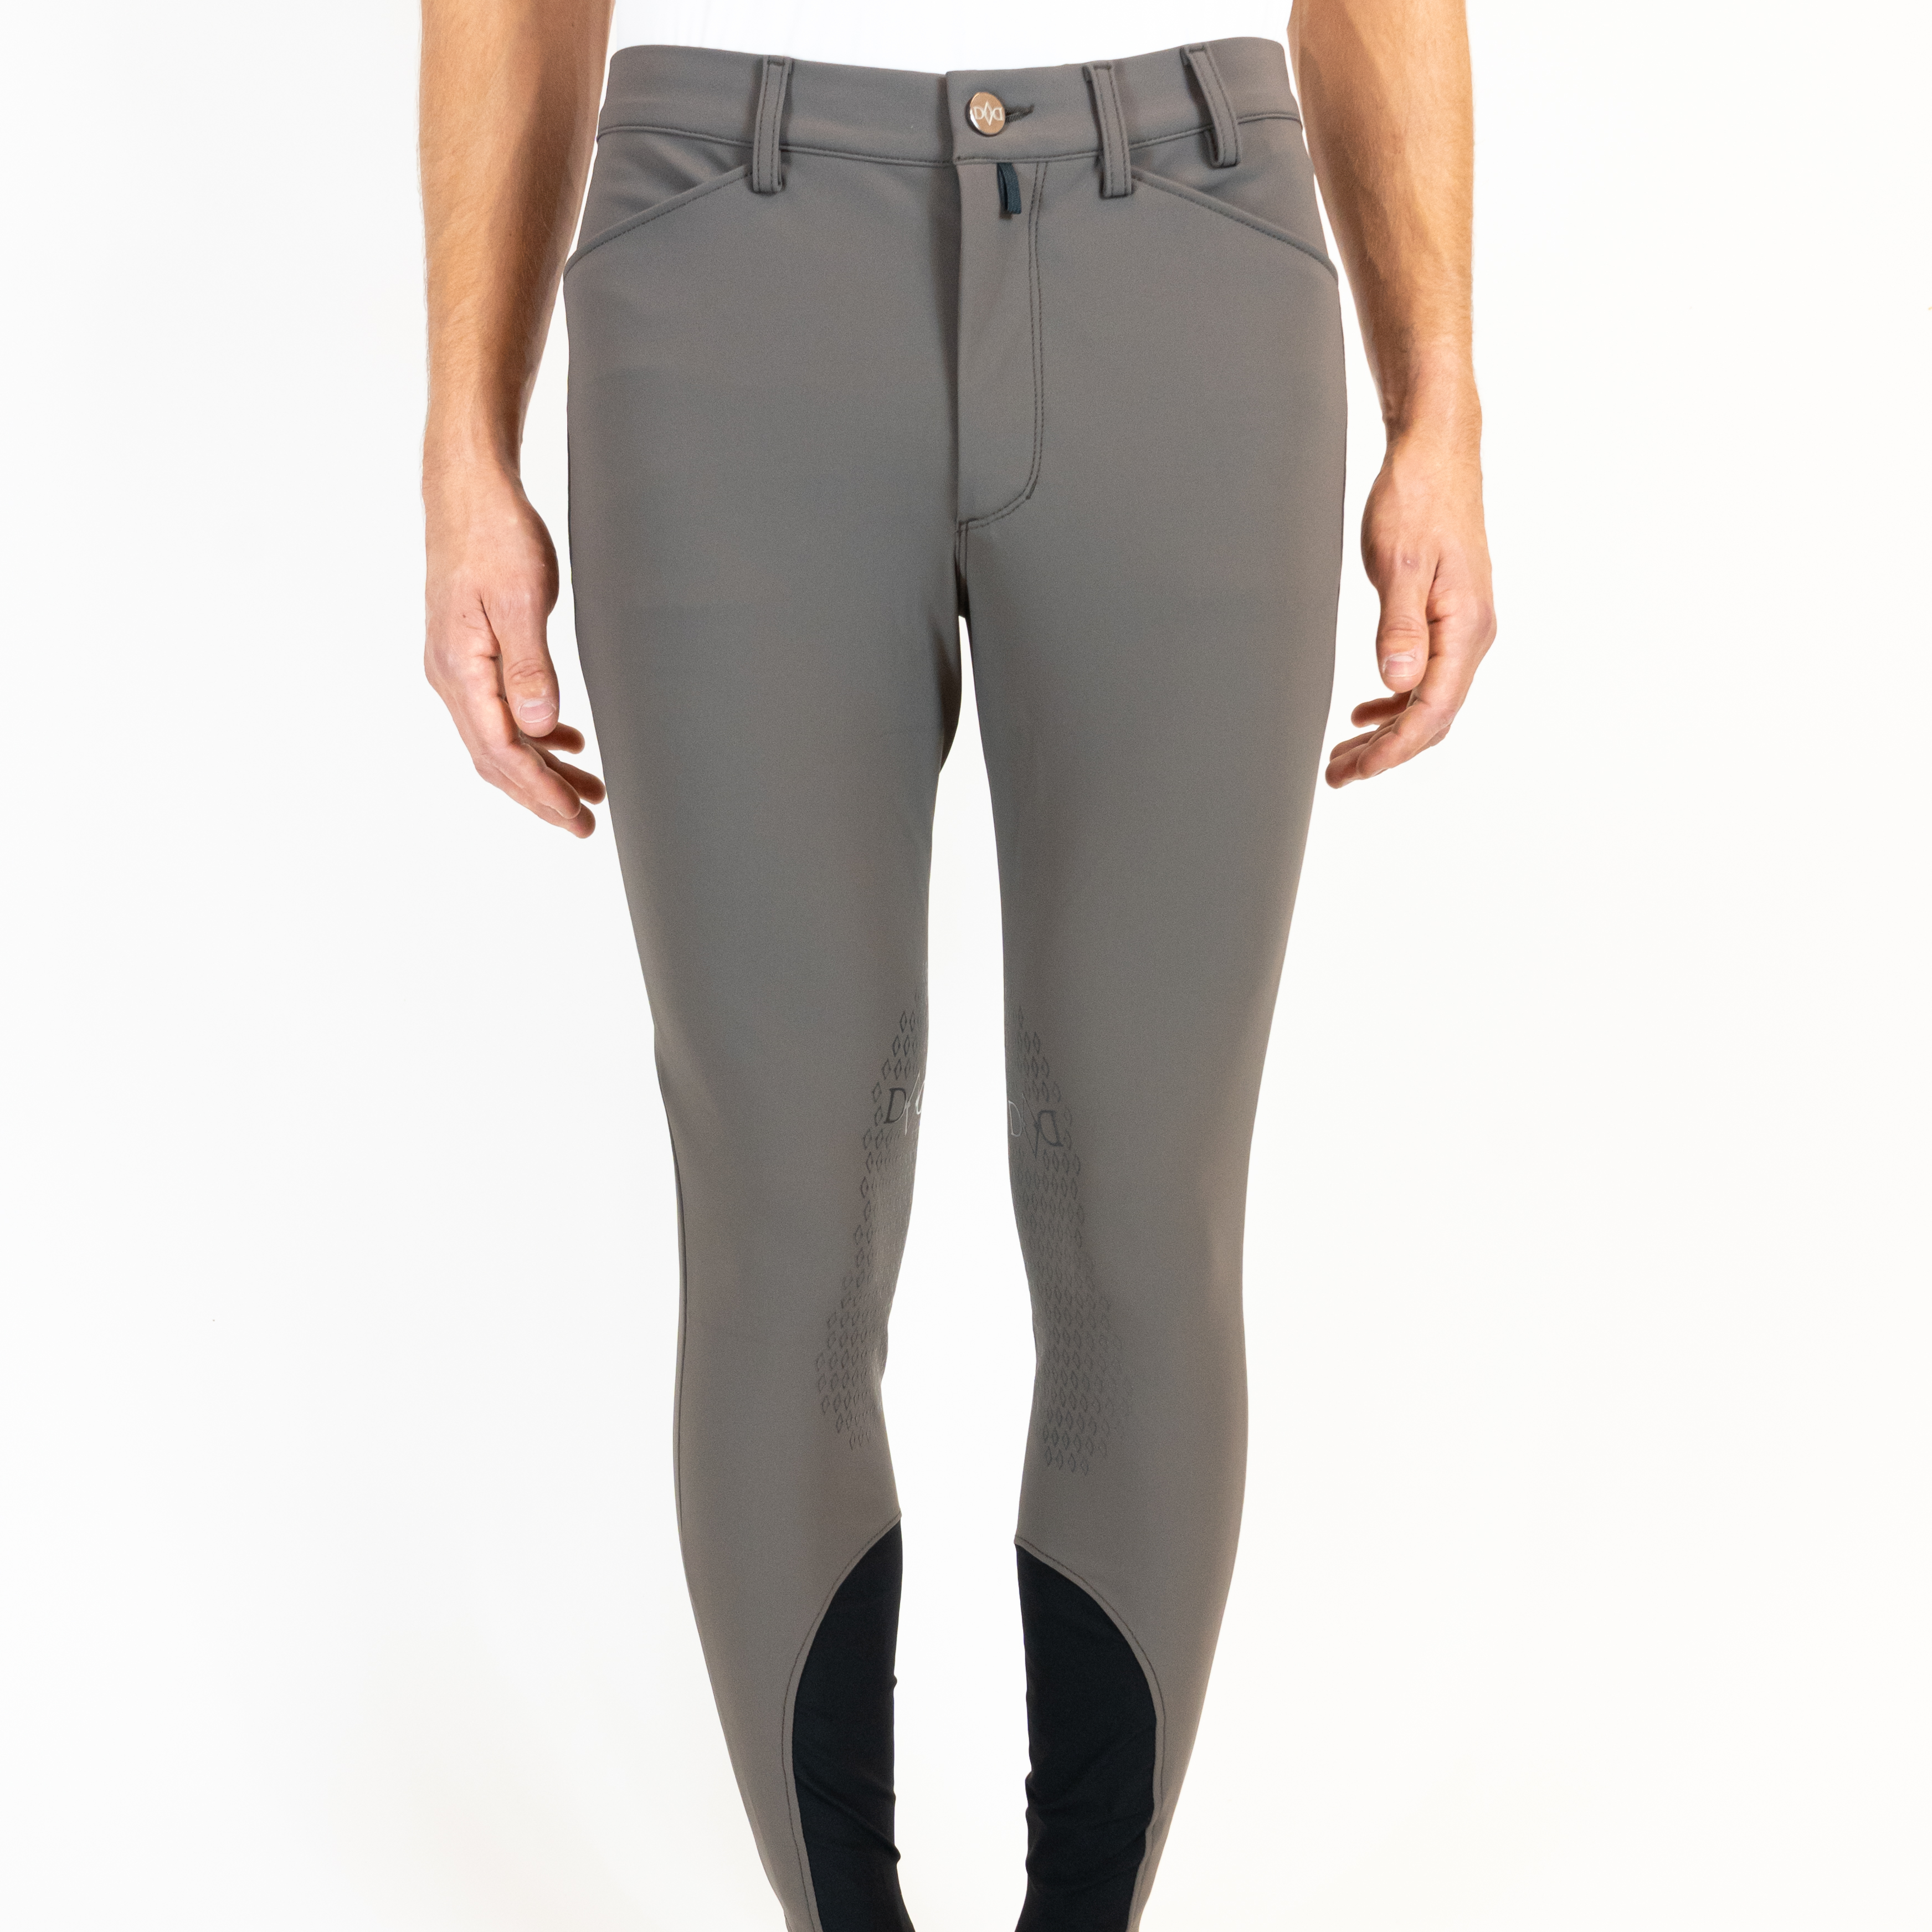 Brave - ULTIME TAGLIE pantaloni uomo 4S